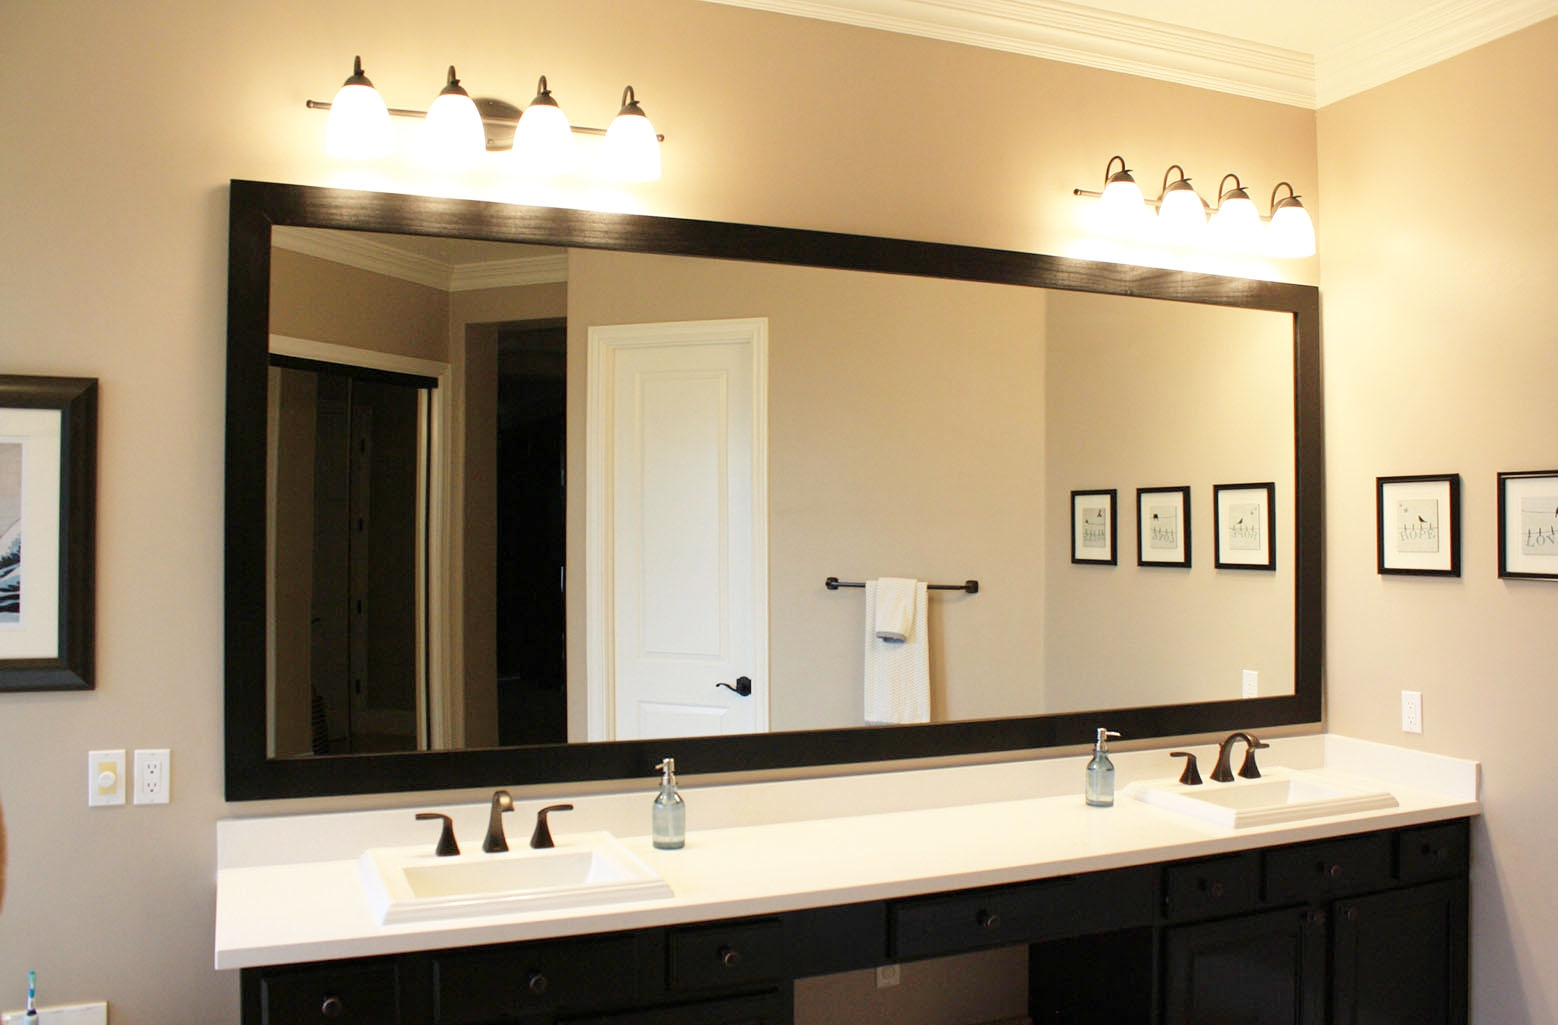 Hanging A Large Bathroom Mirror